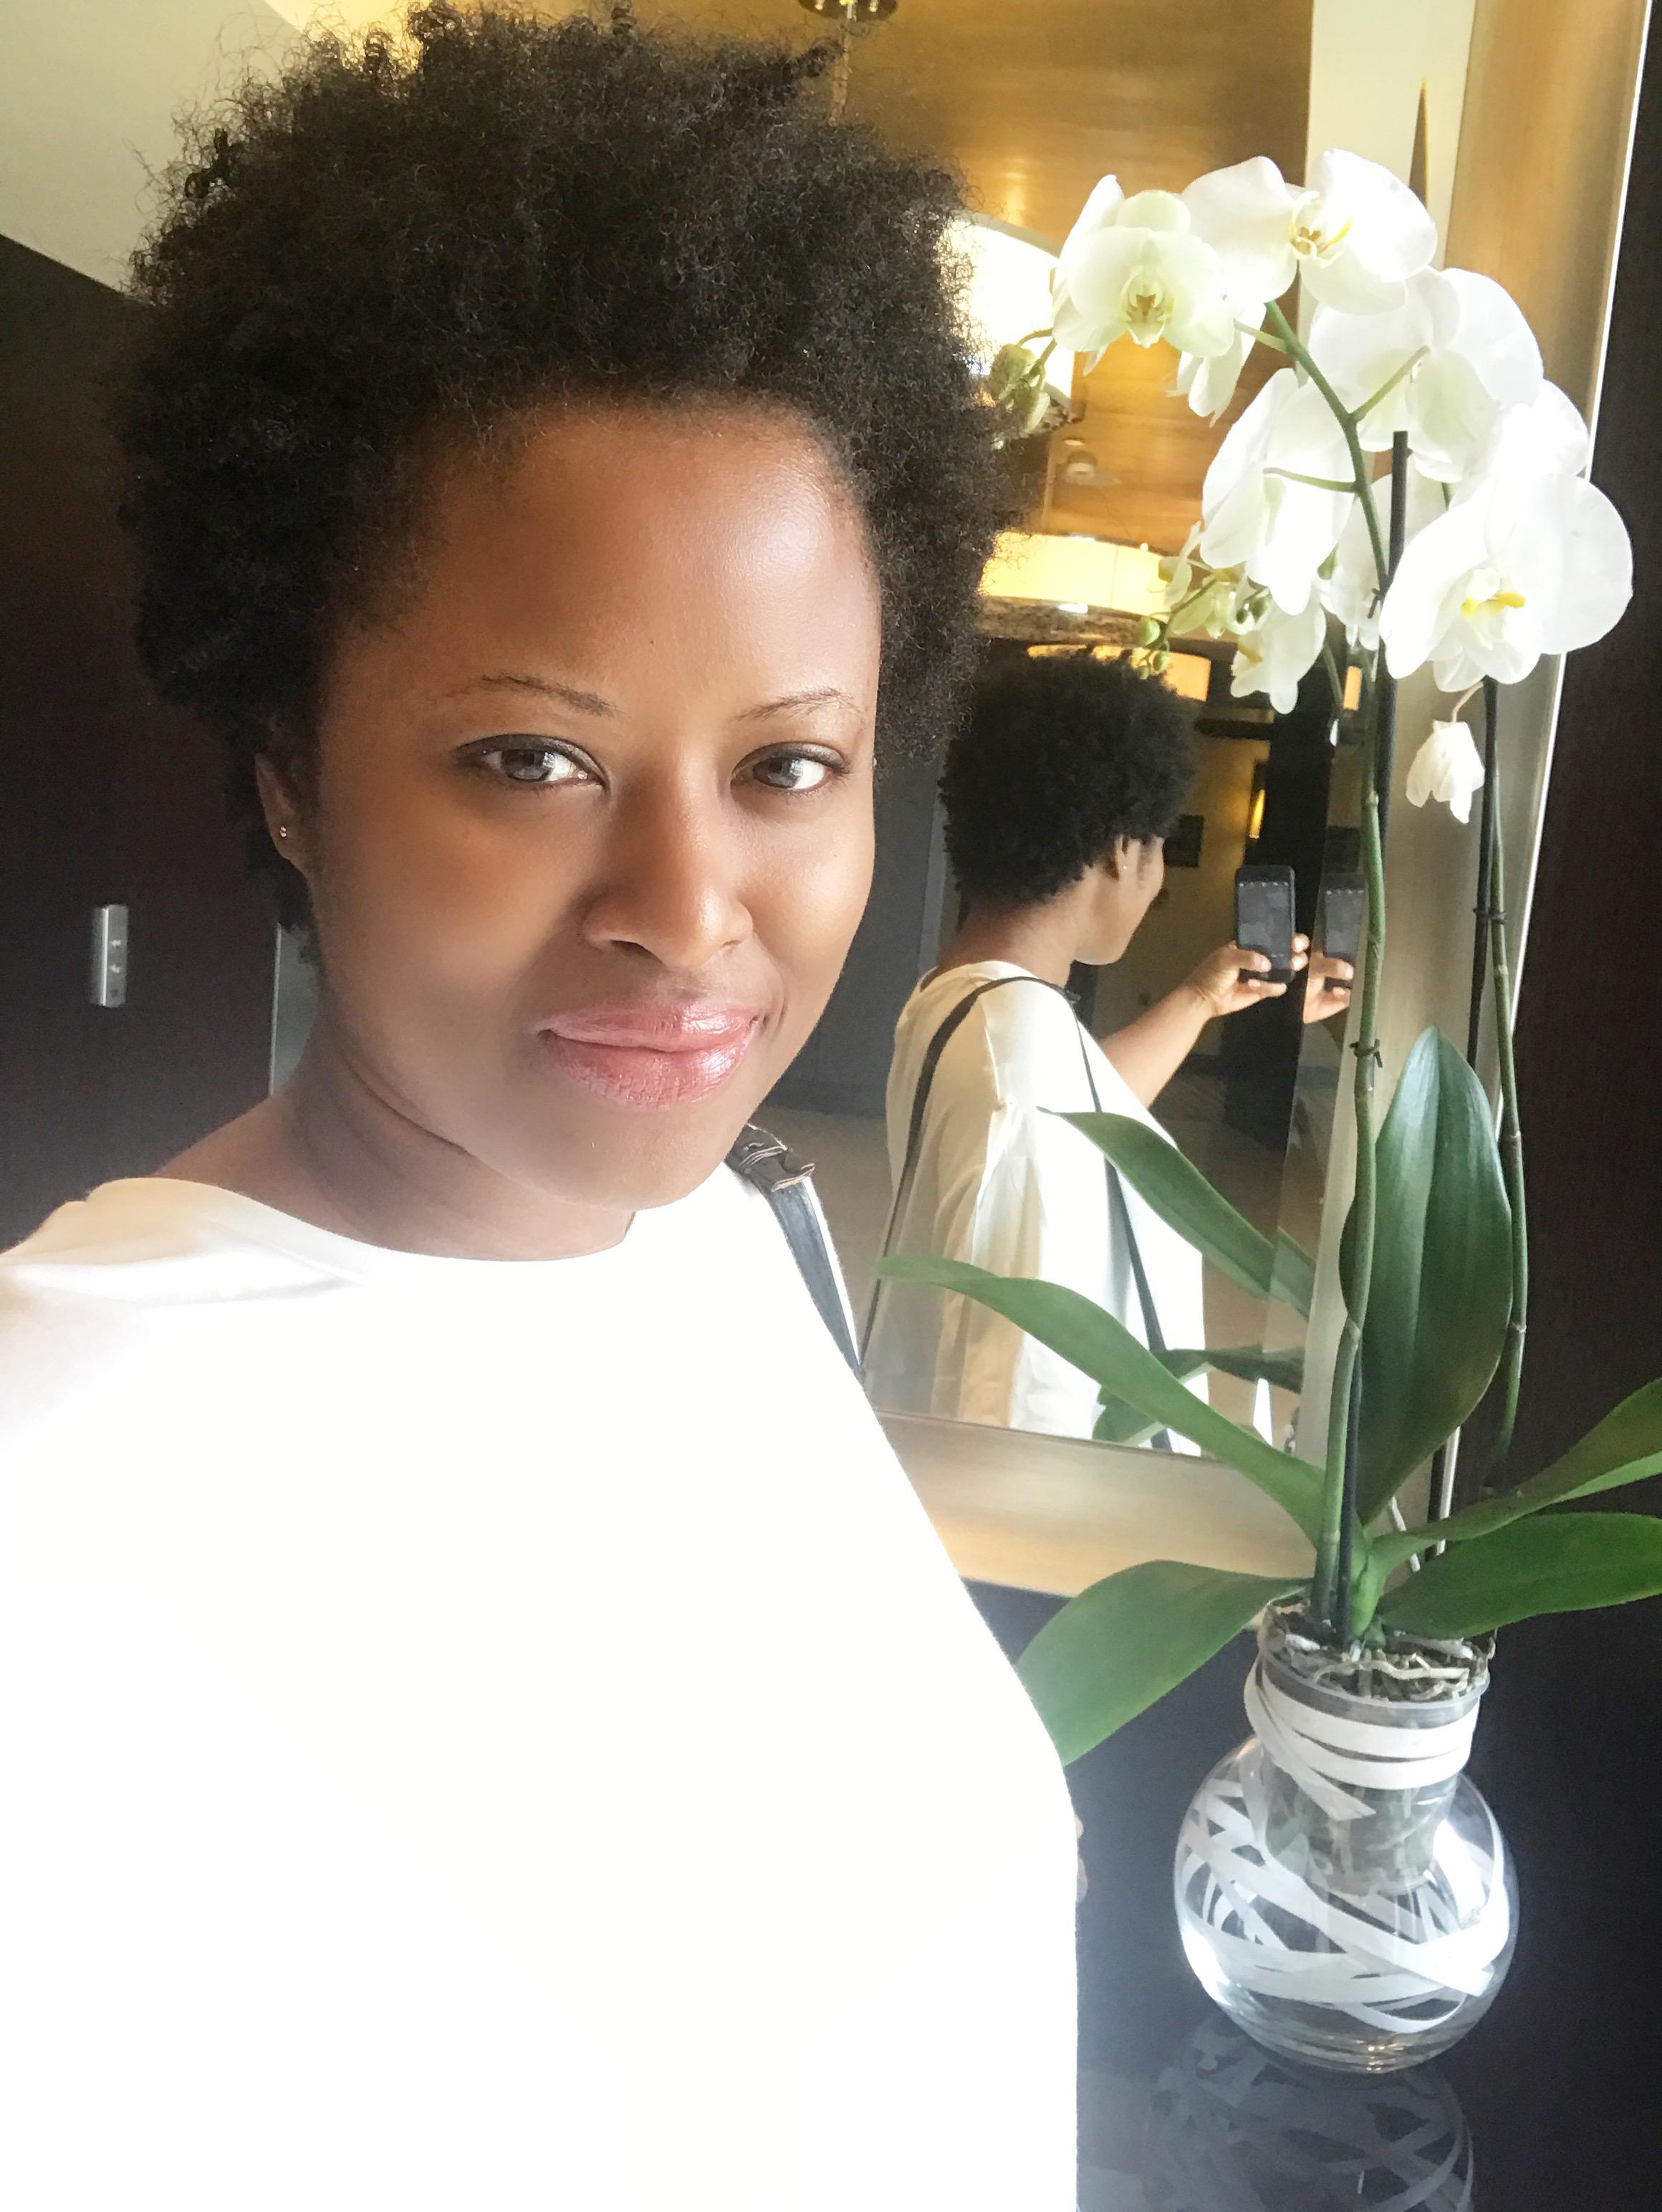 Kempinski-Goldcoast-Accra-Hotel-Review-Photos-vickieremoeofficial12.JPG